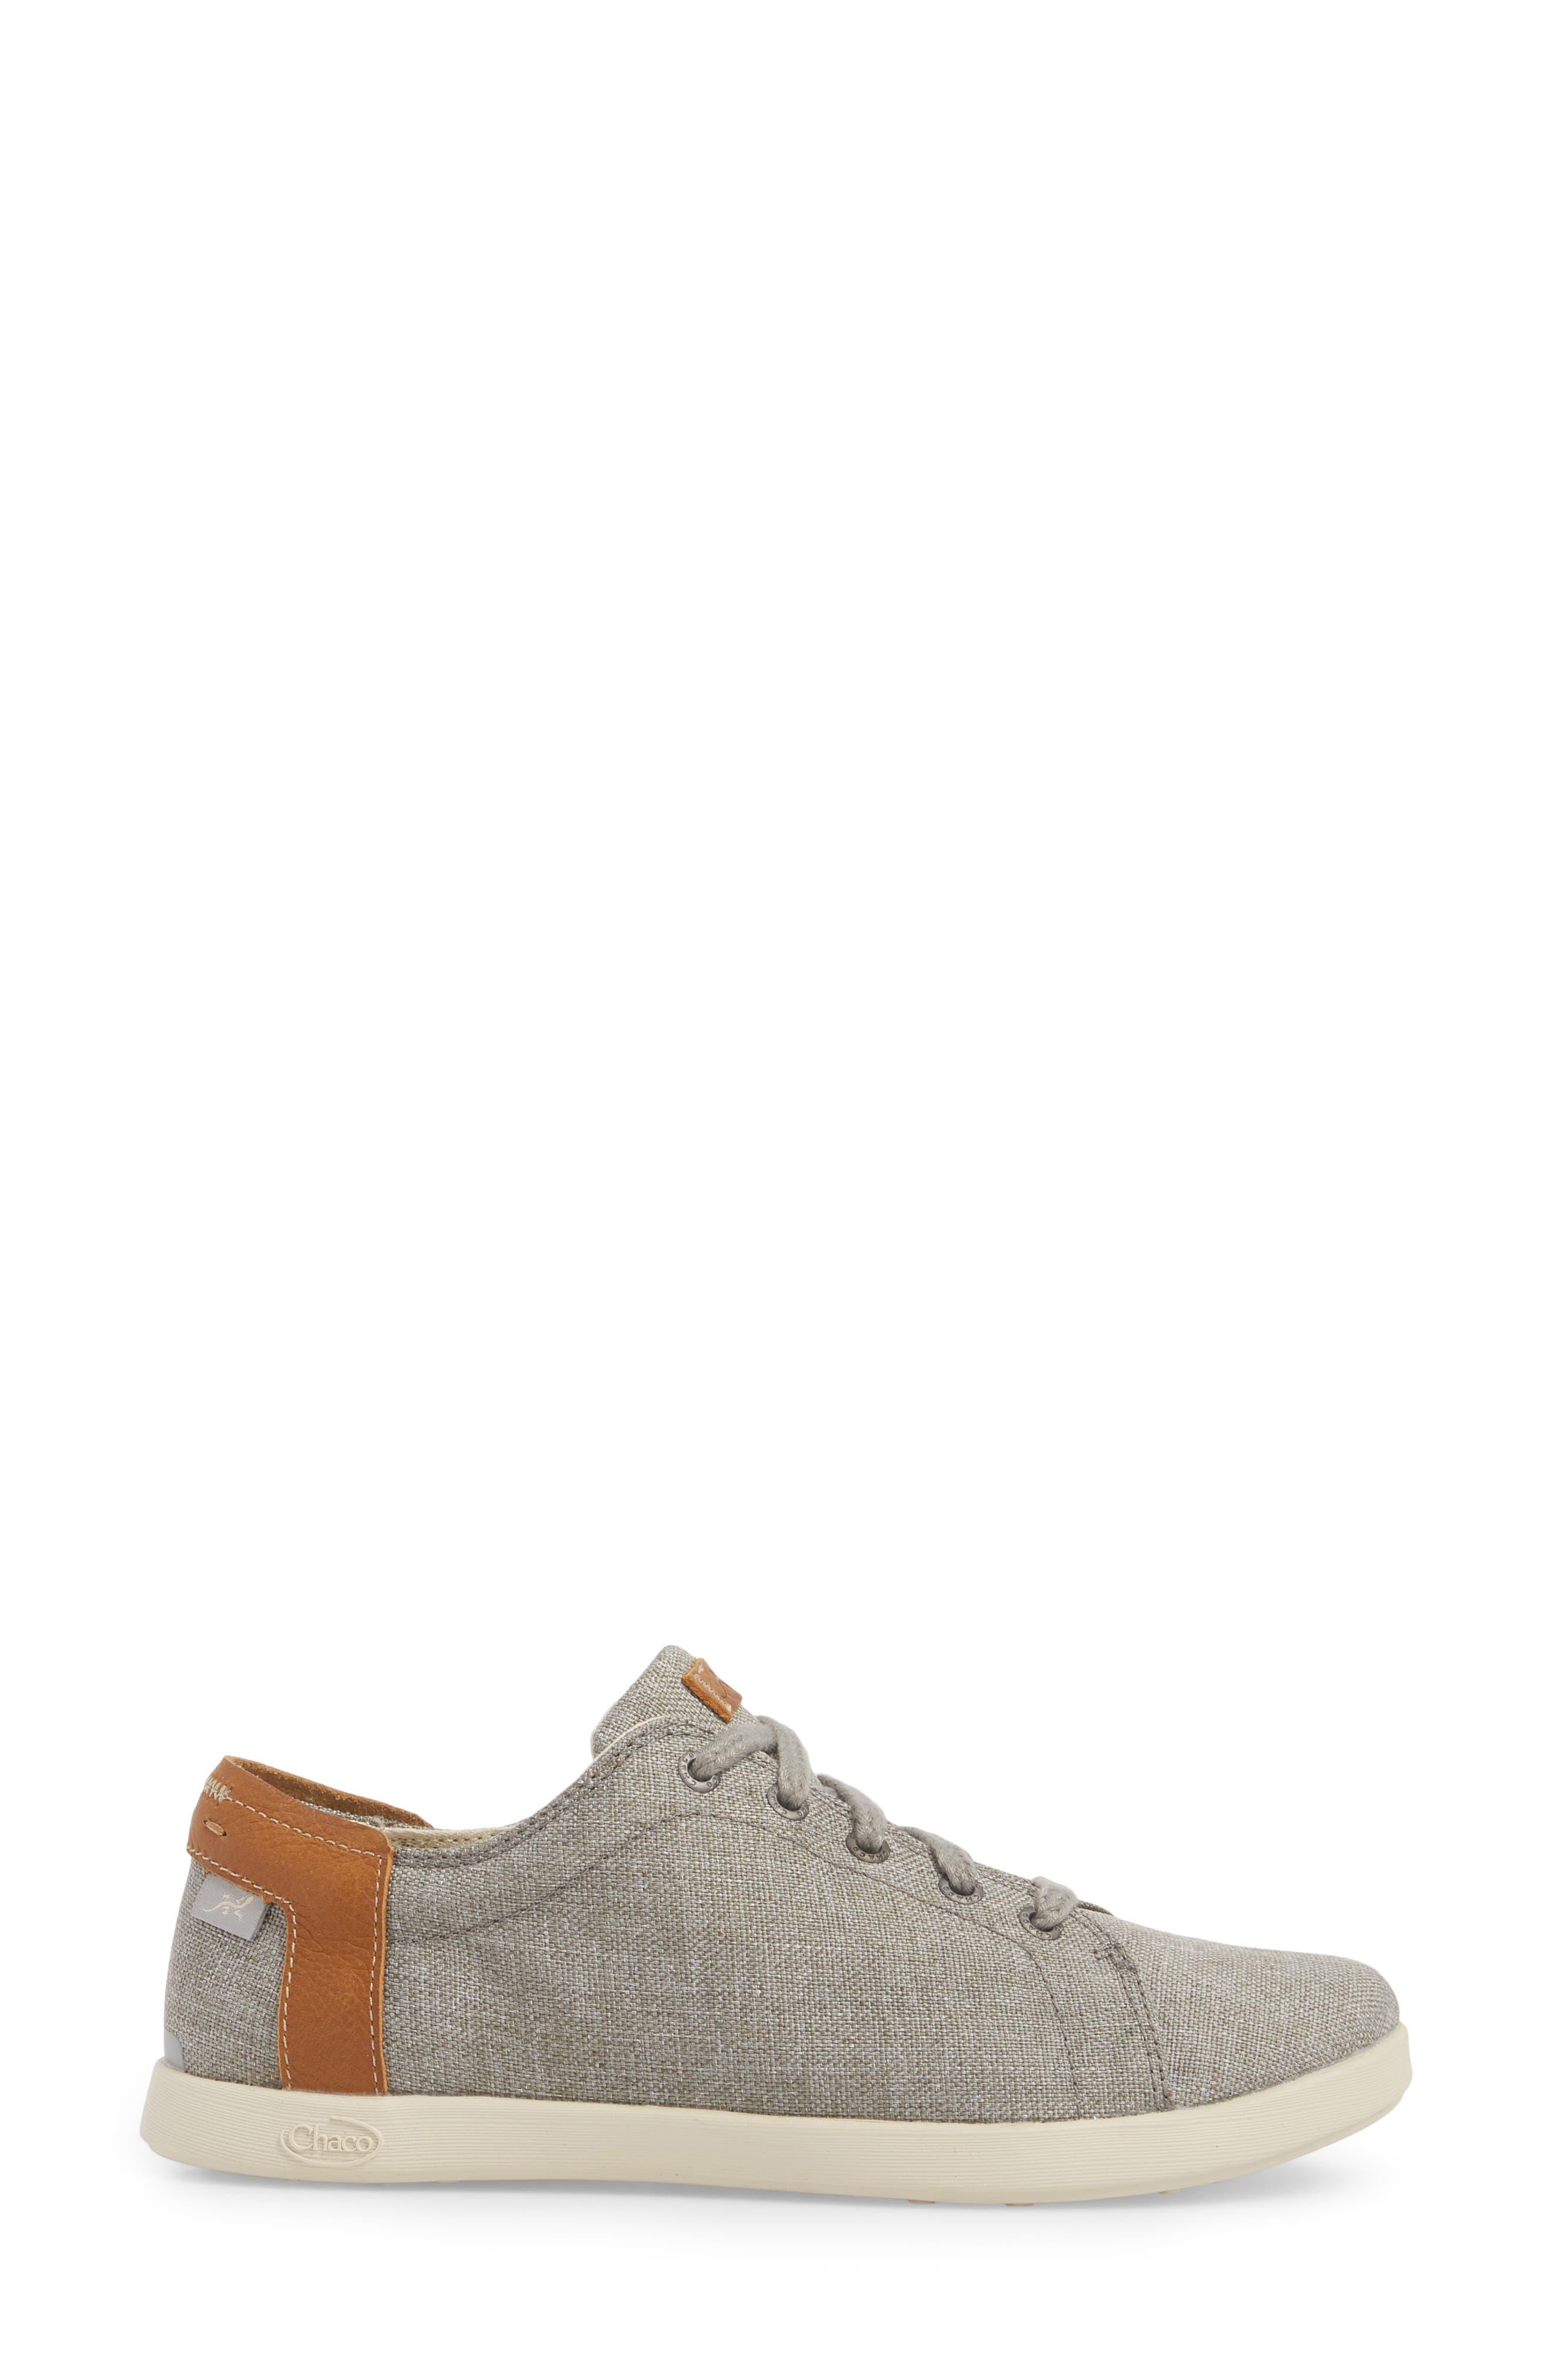 Ionia Sneaker,                             Alternate thumbnail 3, color,                             Gray Canvas